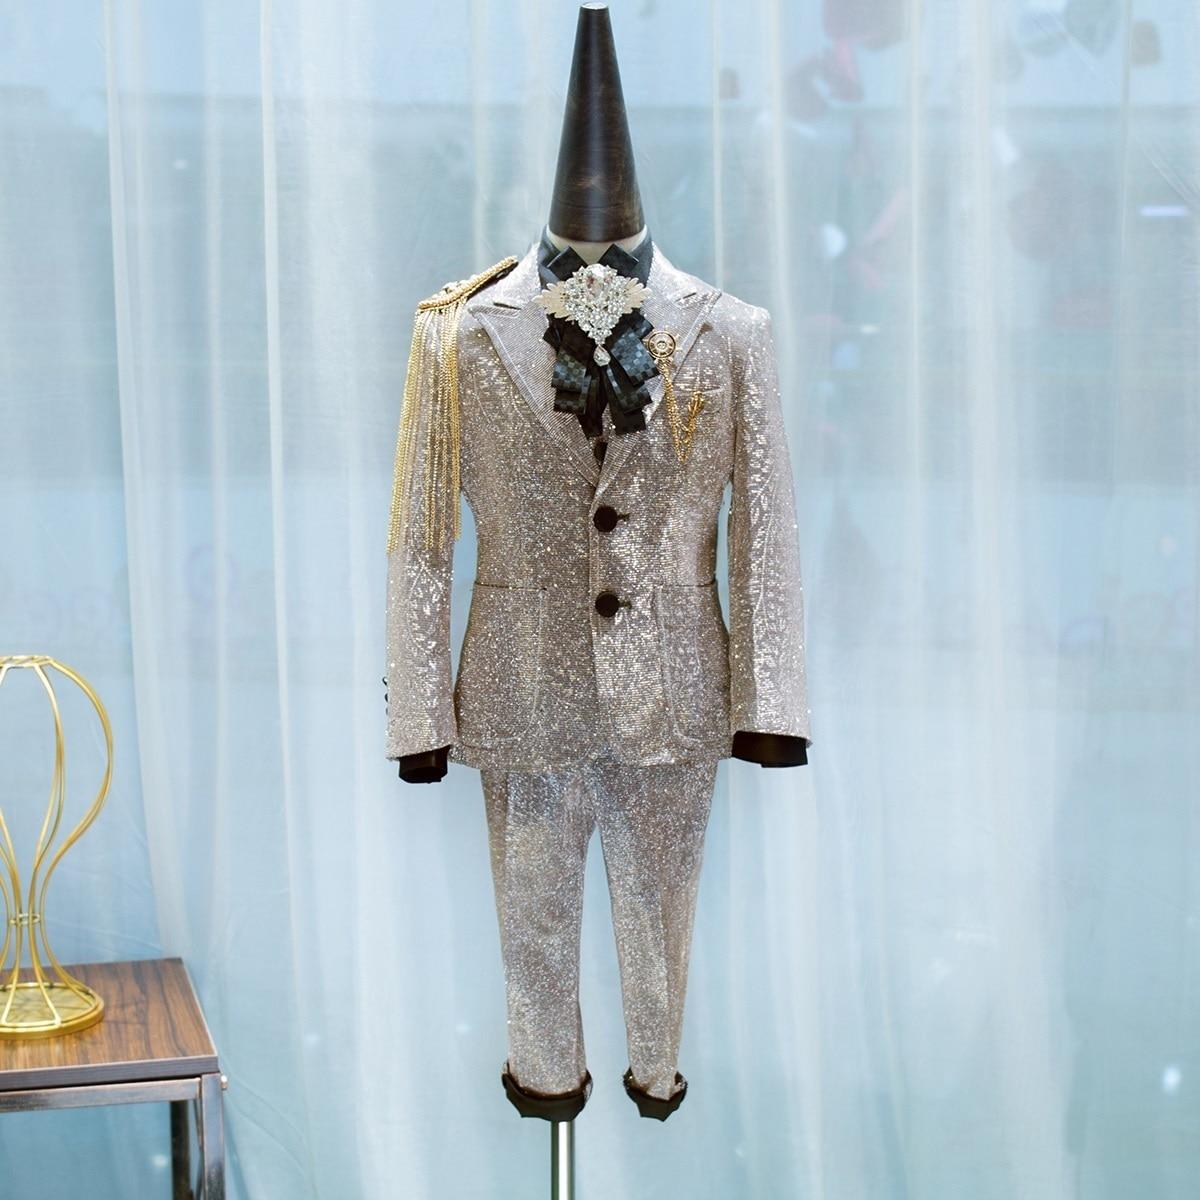 Kid's Wedding Suit For Boy Tuxedo Golden Catwalk Piano Fomal Prom Dresses School Performance Costume Children Clothing Set